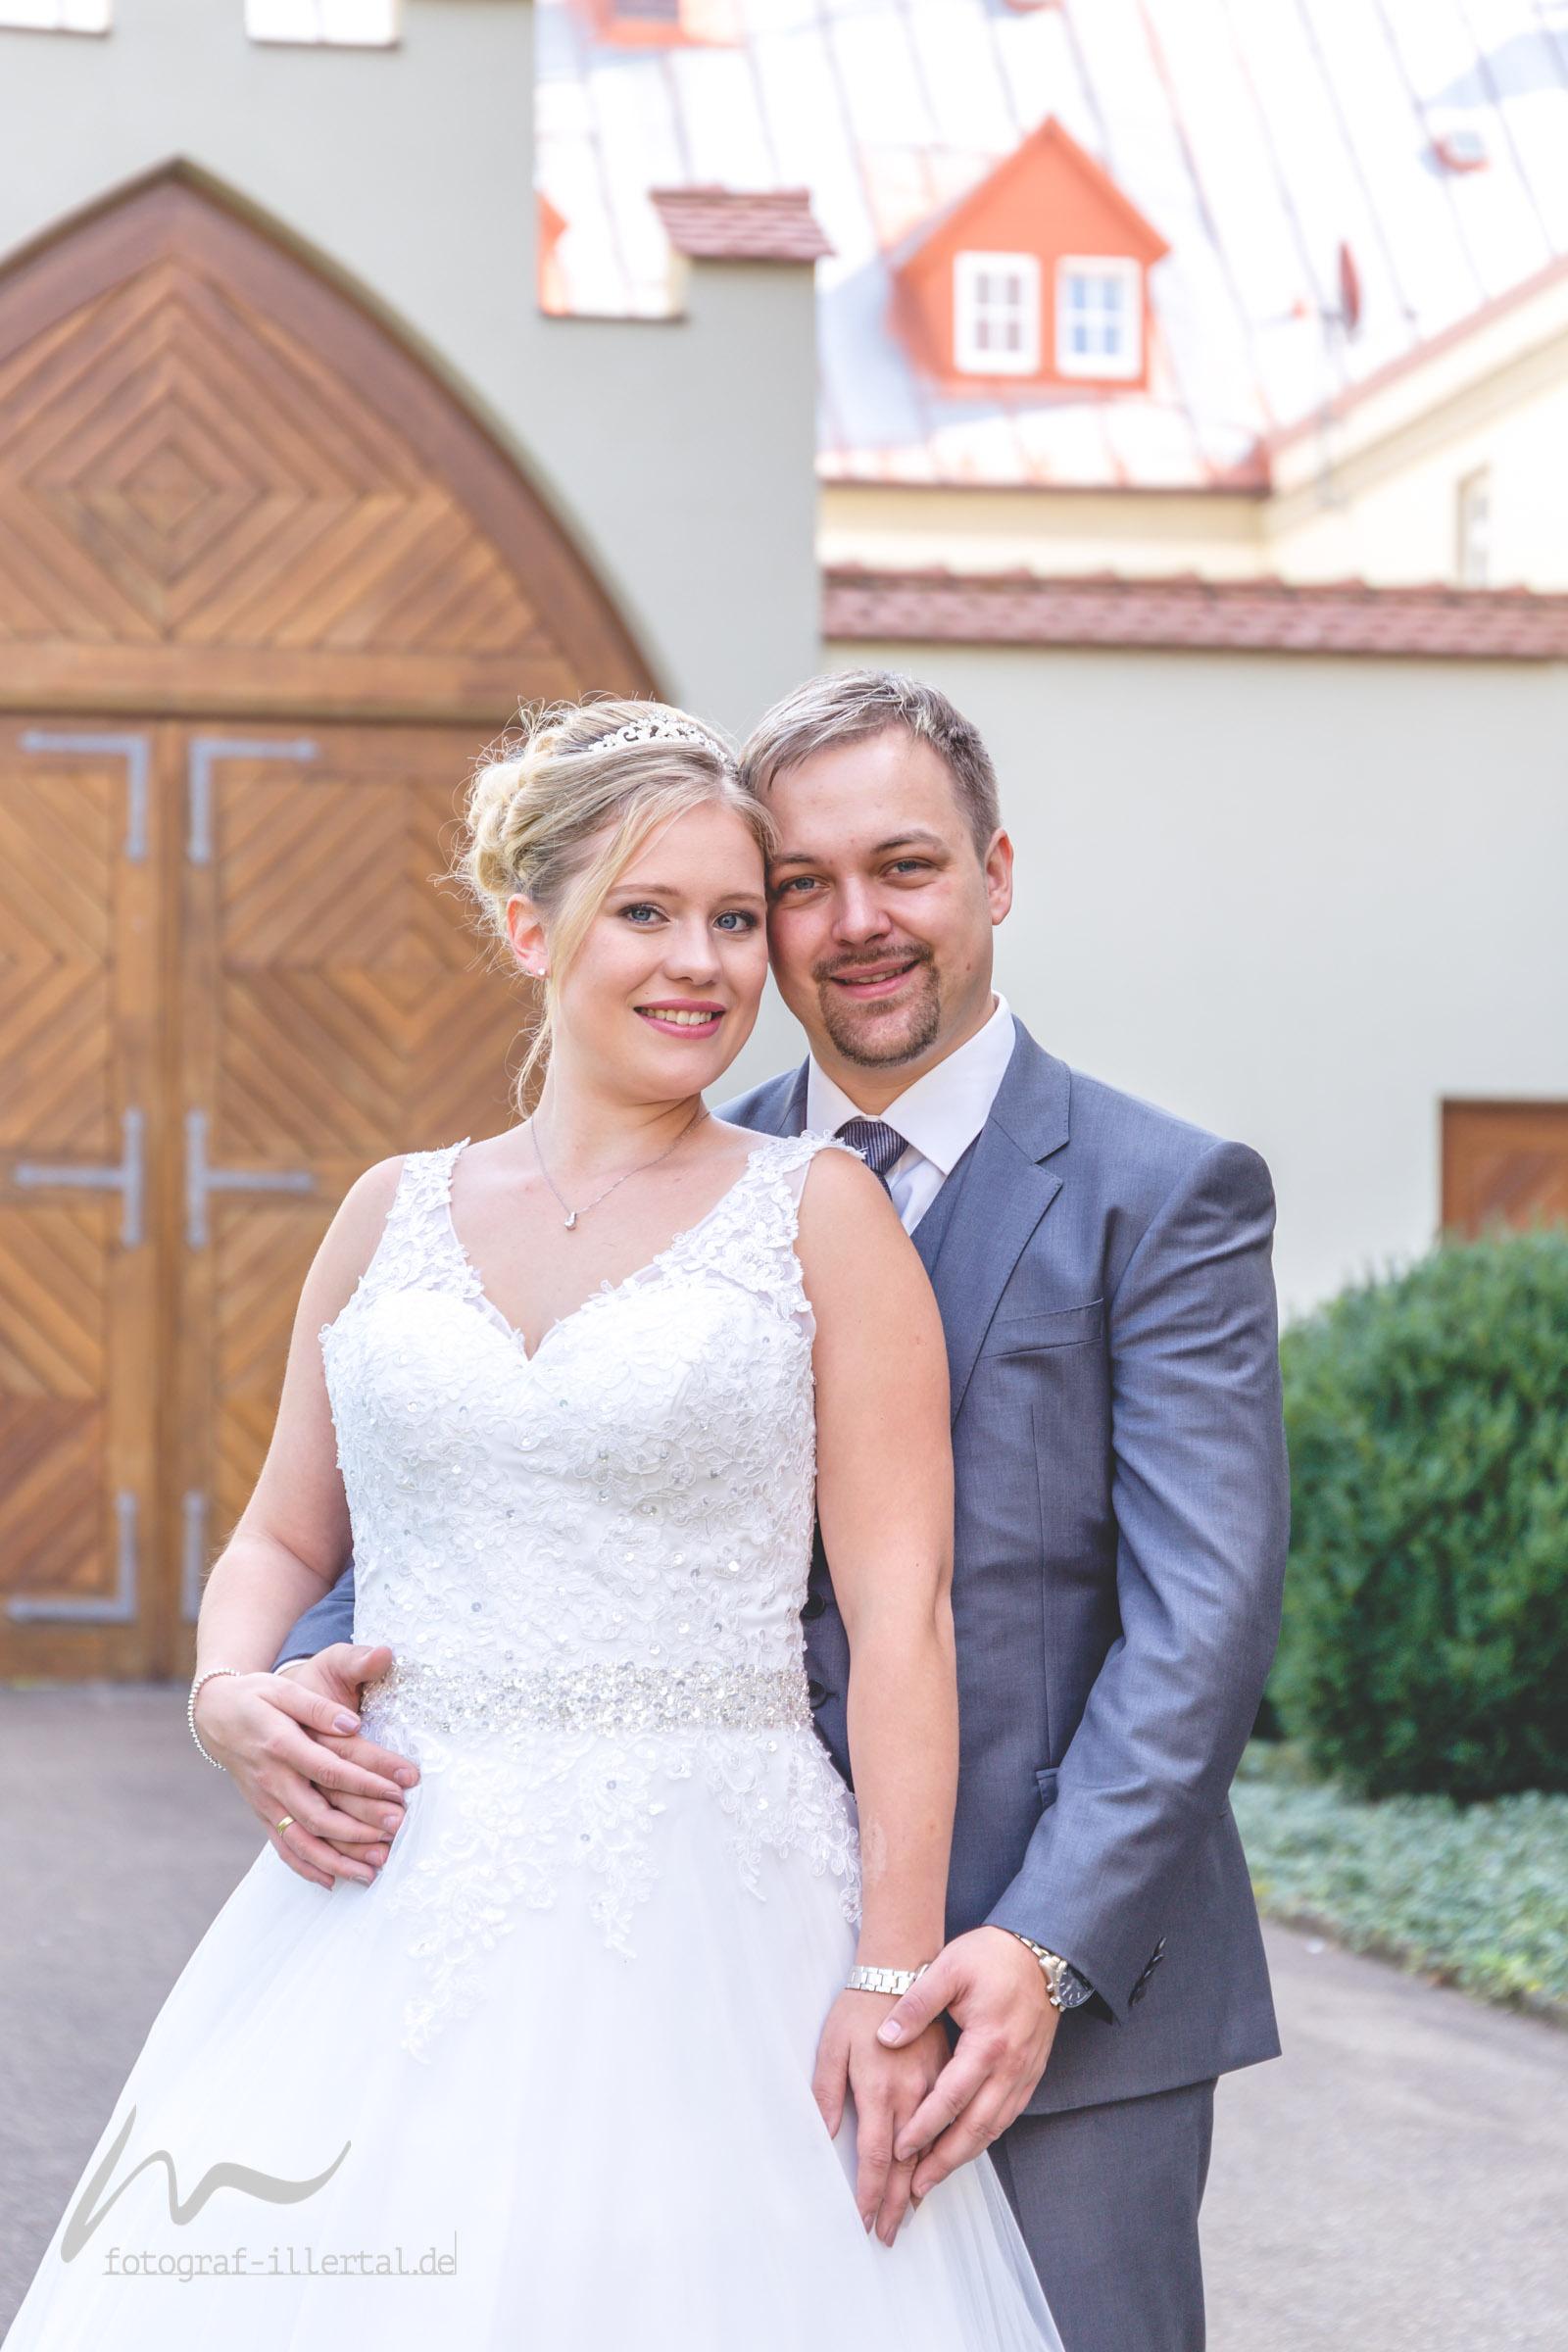 Fotograf Illertal-Christian Miller-Hochzeitsfotografie-_MG_8137